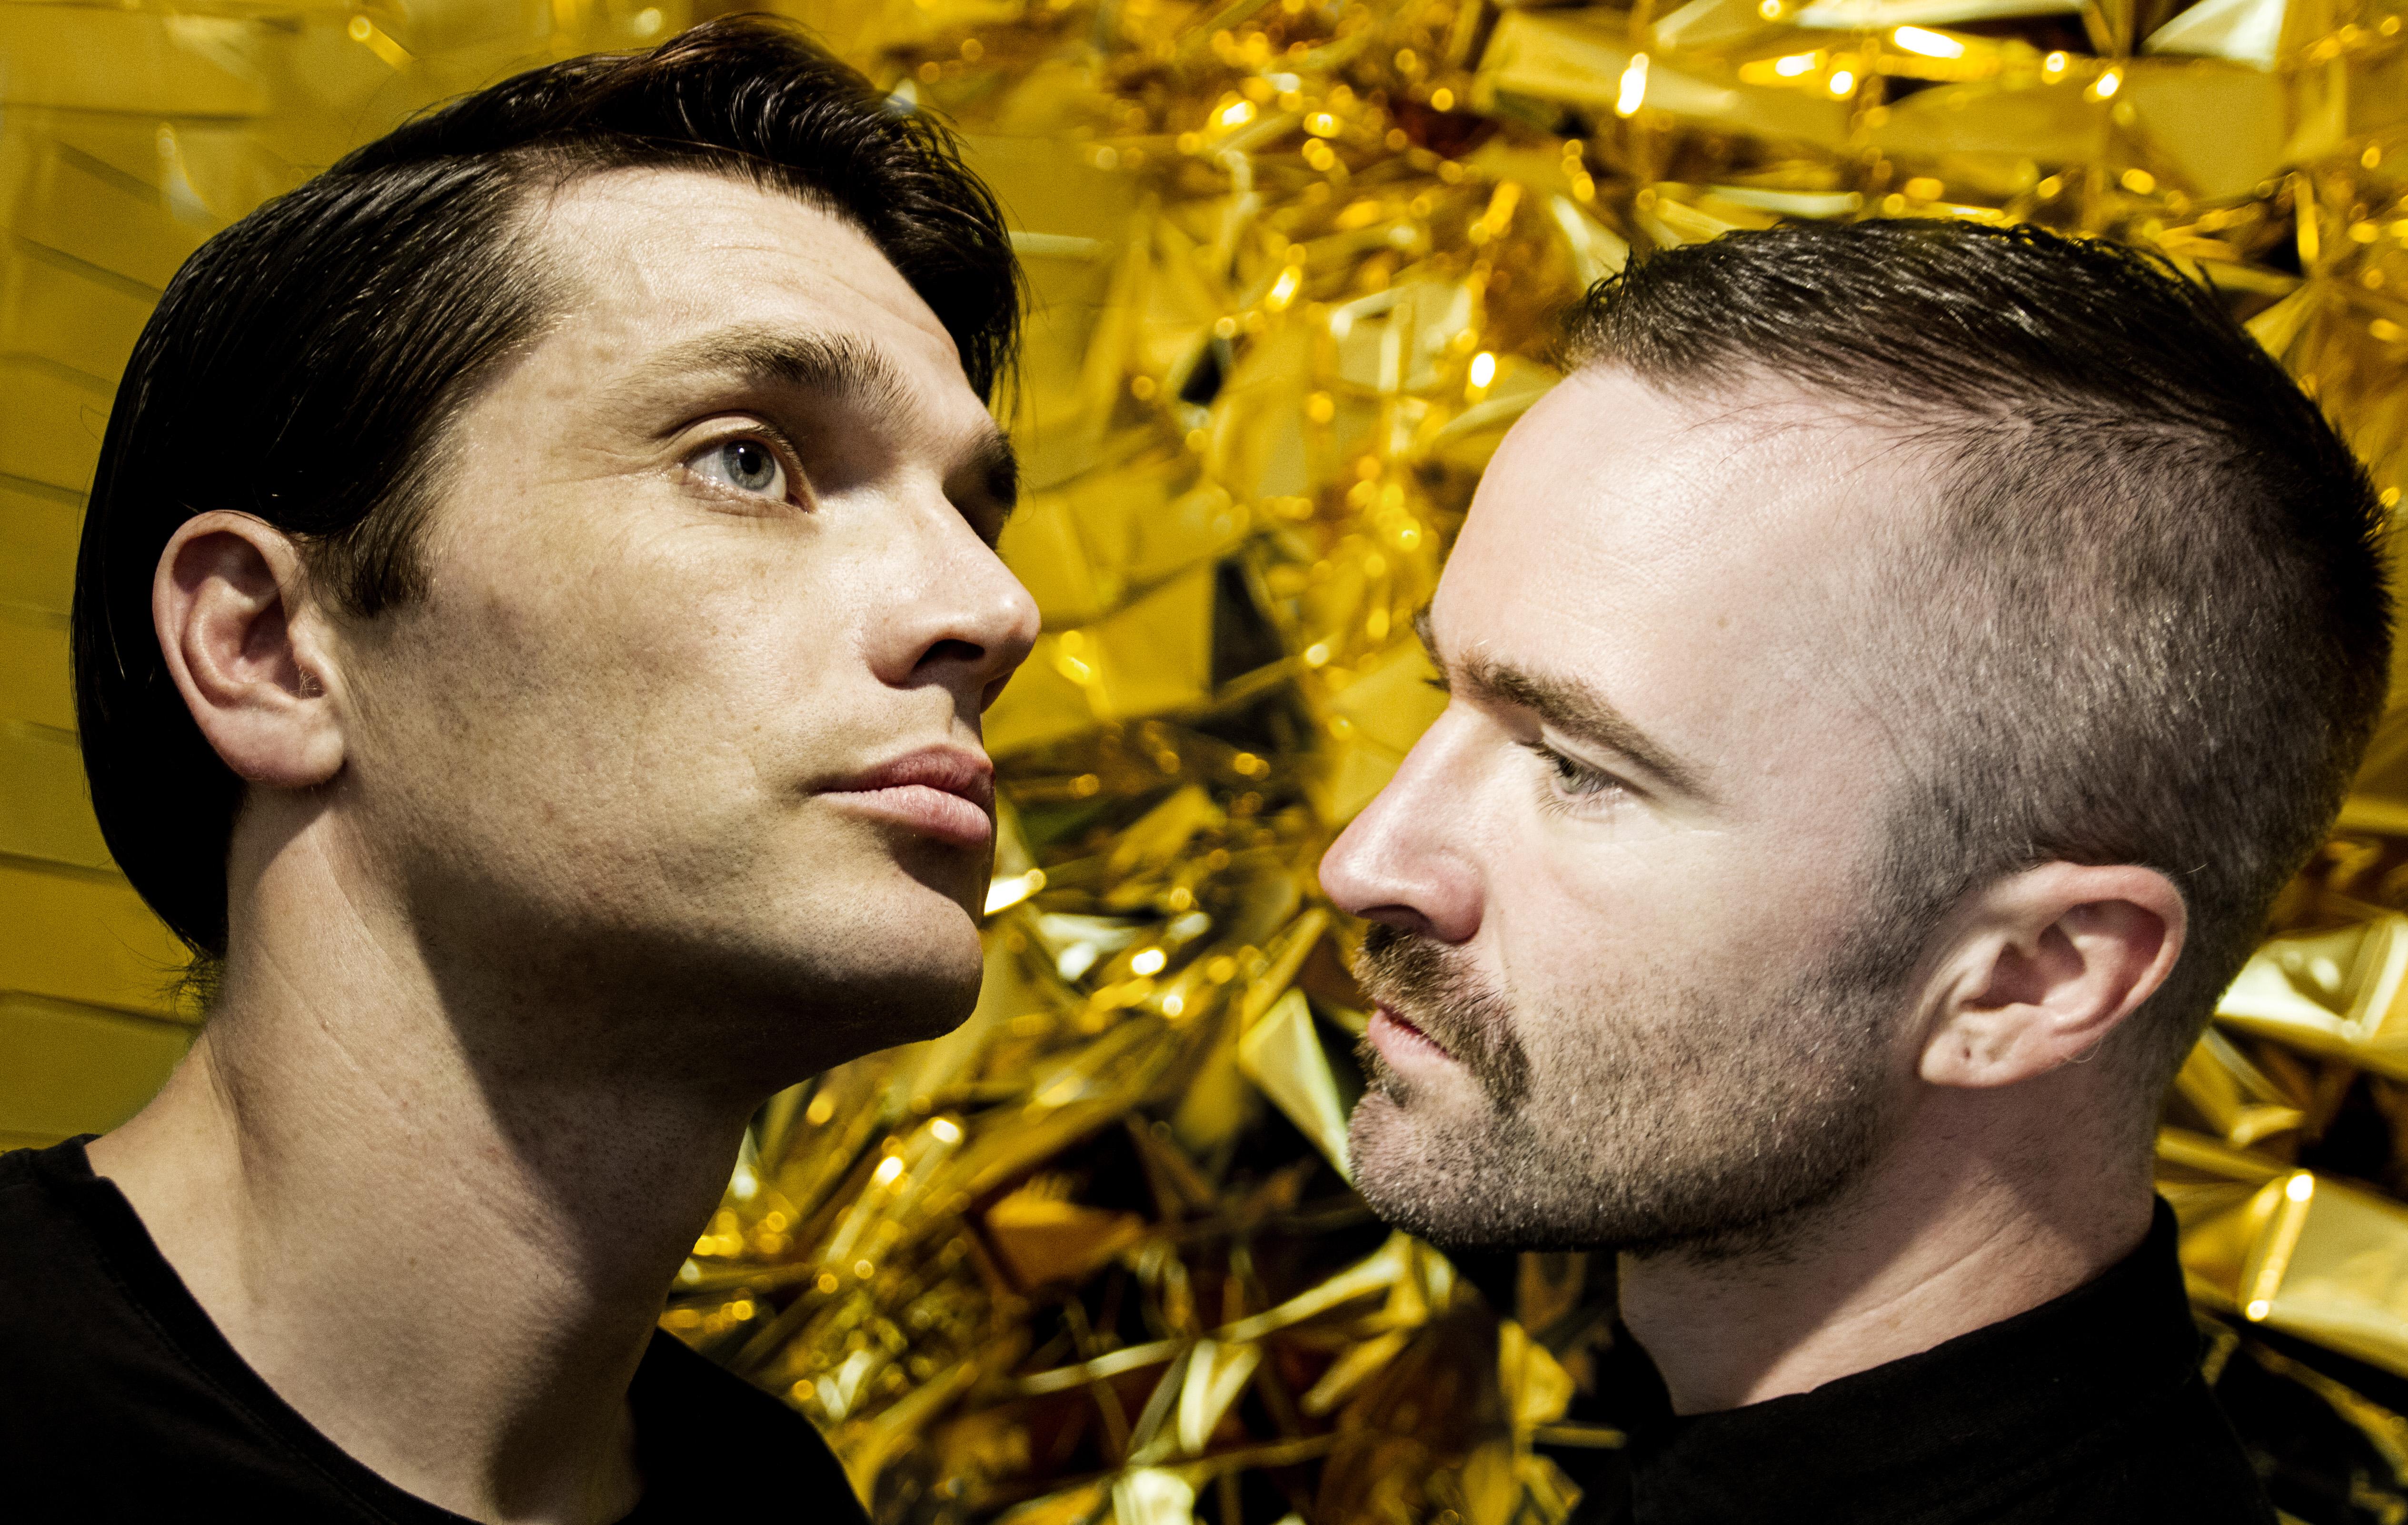 Lakker-Breghain-DJ-Berlin-nightclub